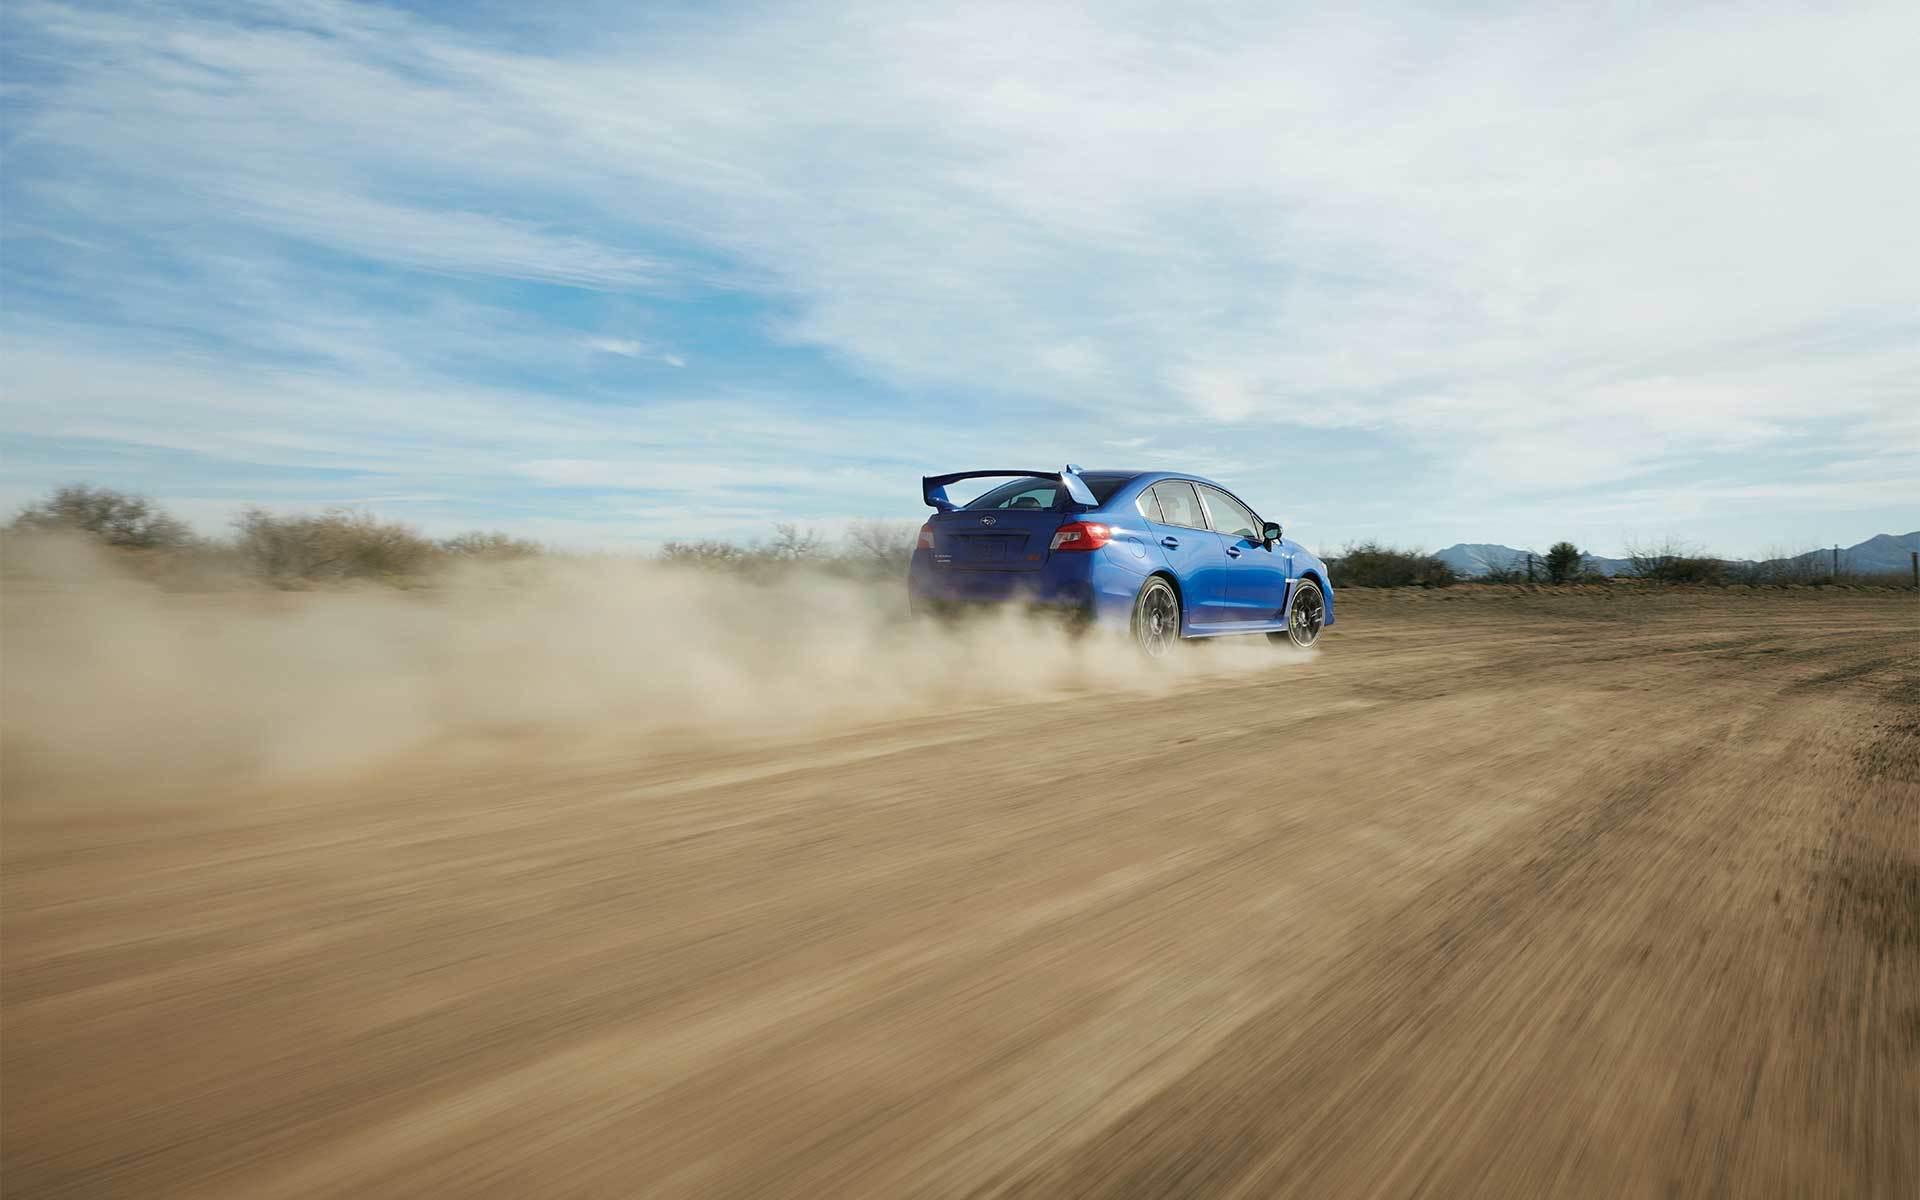 2020 WRX STI Racing on Dirt